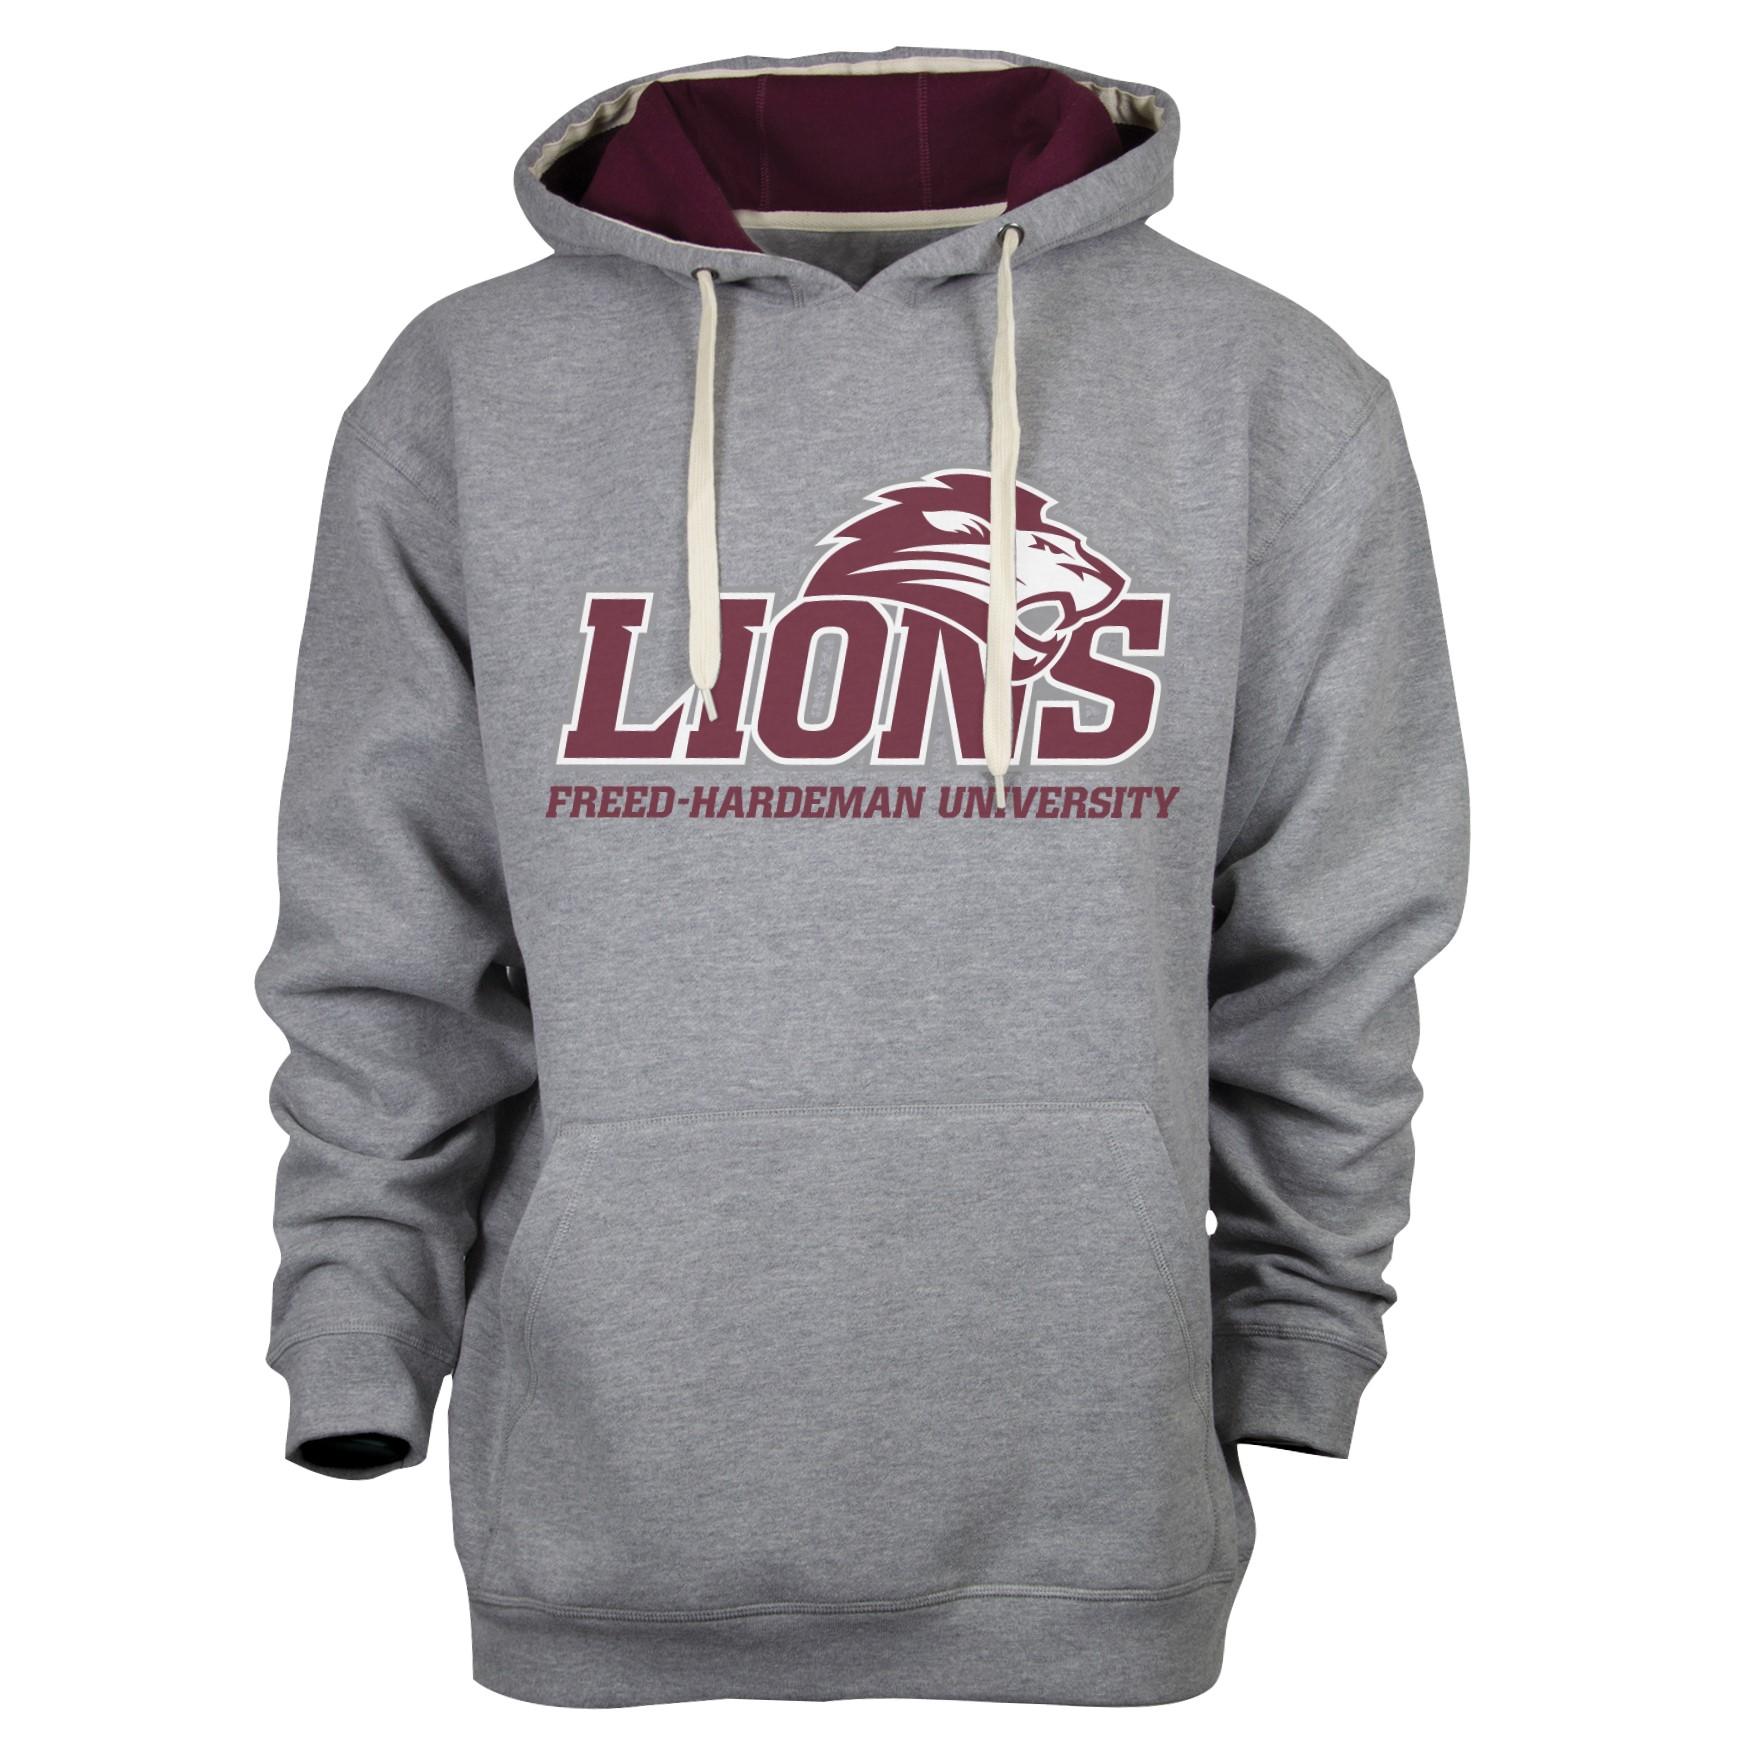 Freed-Hardeman Lions Hoodie